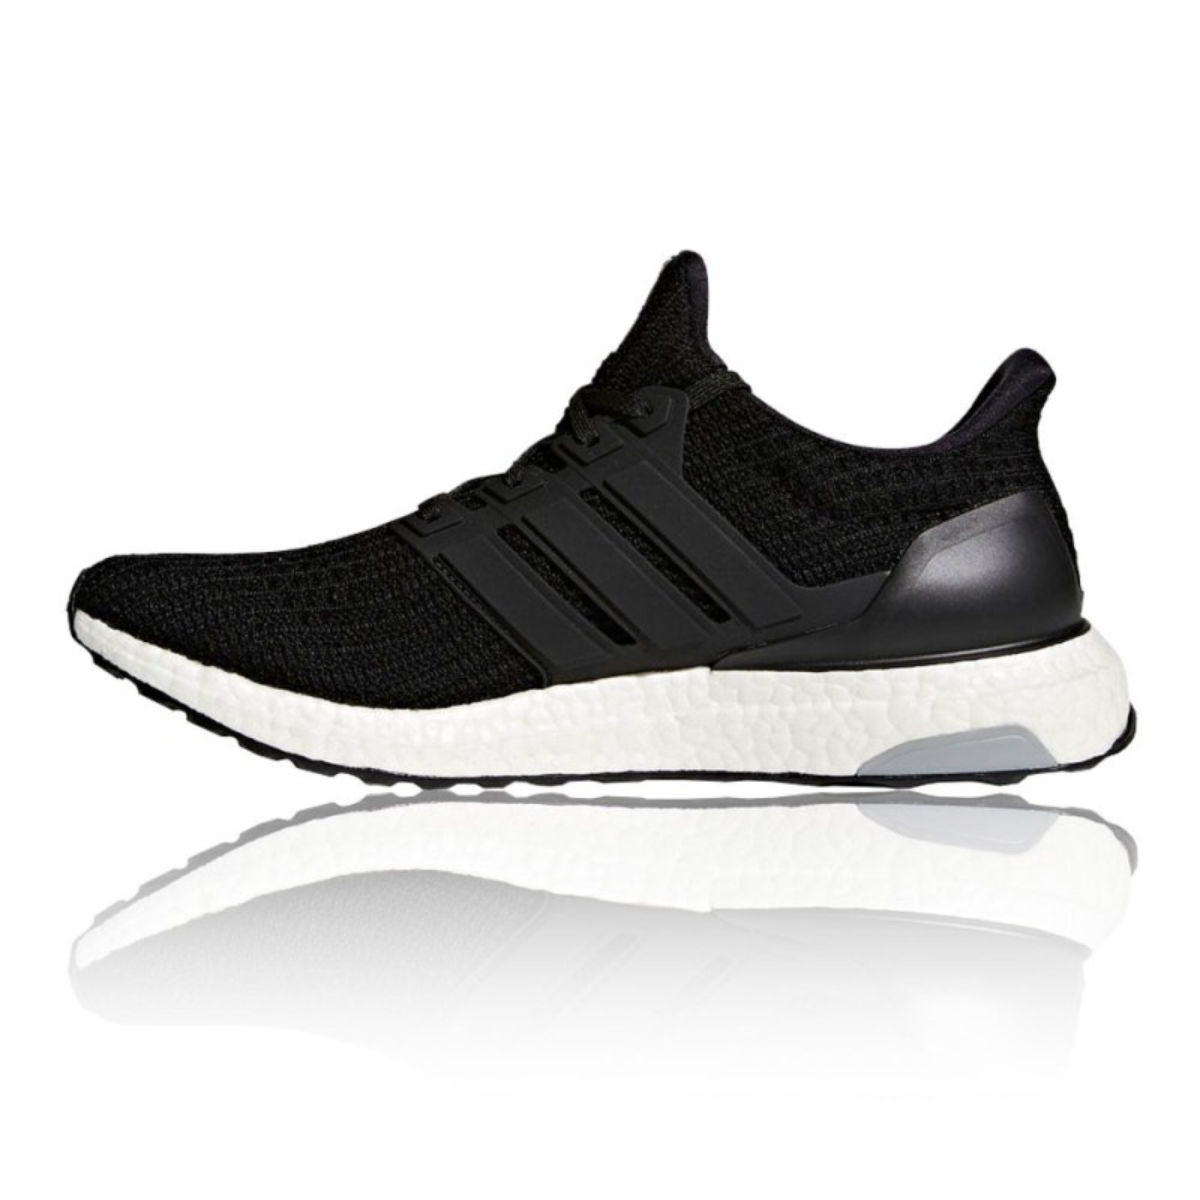 6a0320e464c25 Adidas Ultra Boost Black FW18 Man Running shoes